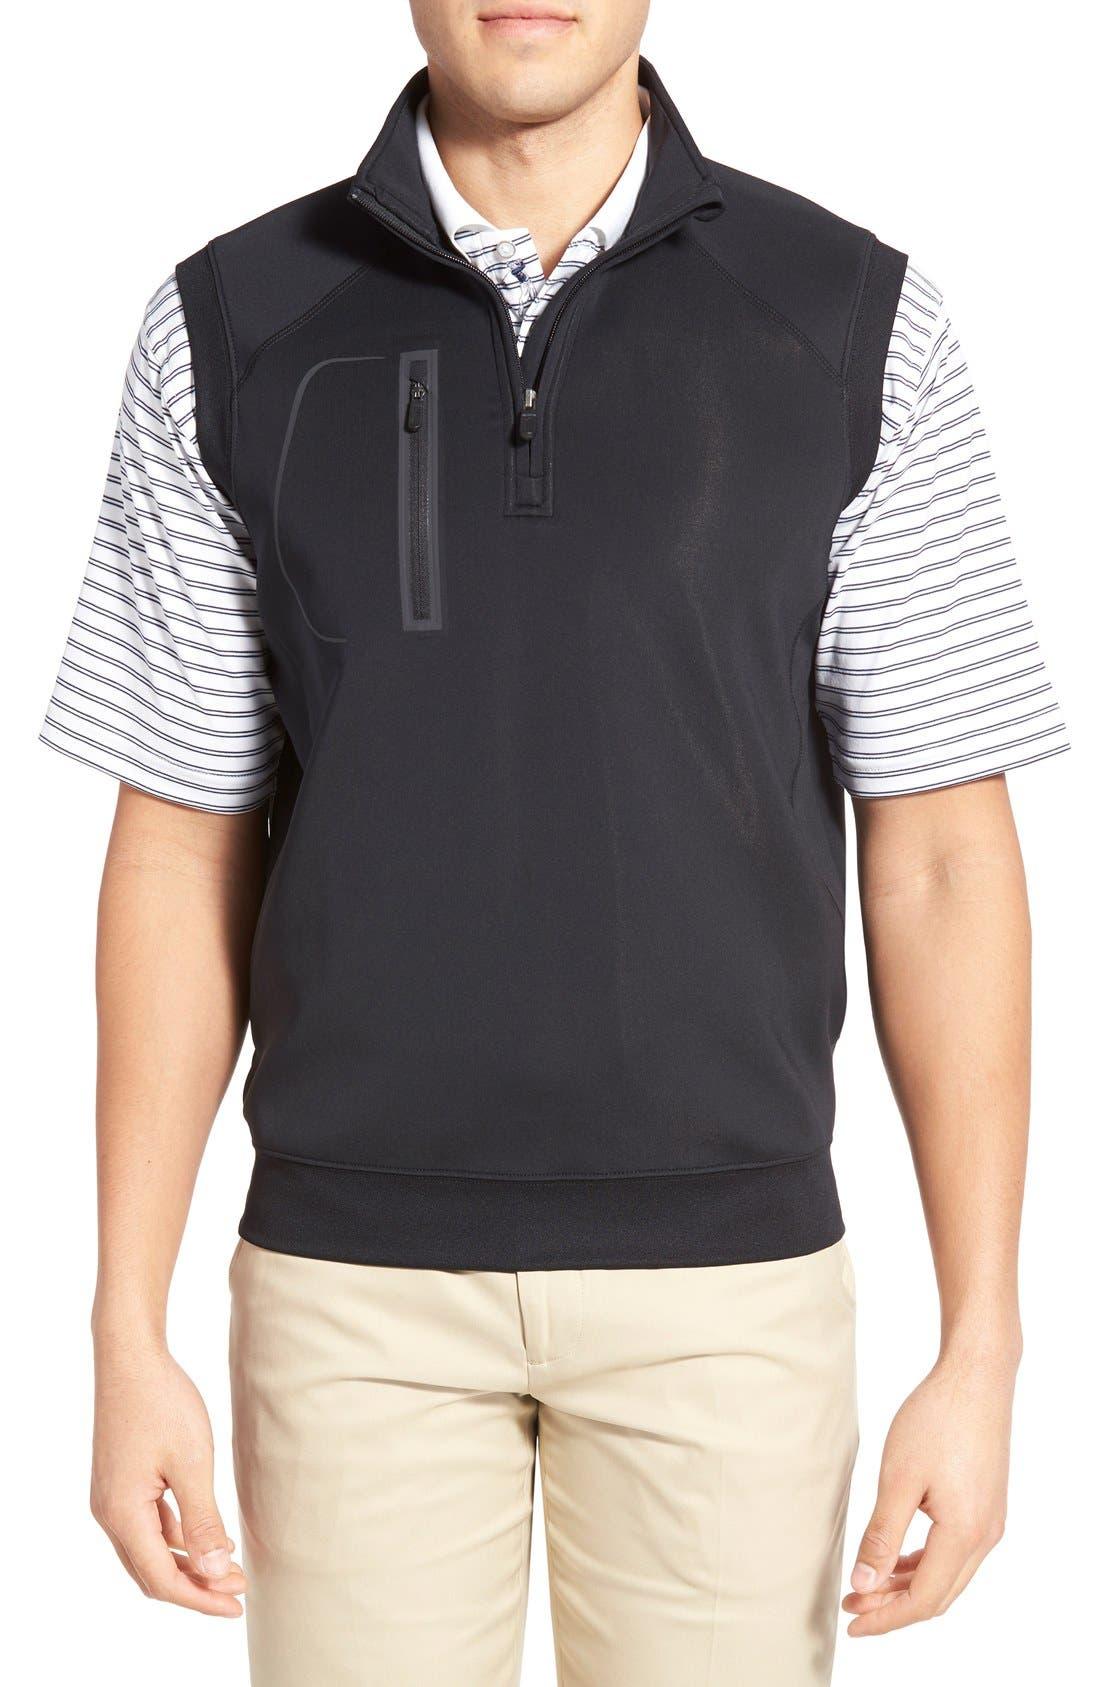 XH2O Crawford Stretch Quarter Zip Golf Vest,                             Main thumbnail 1, color,                             001